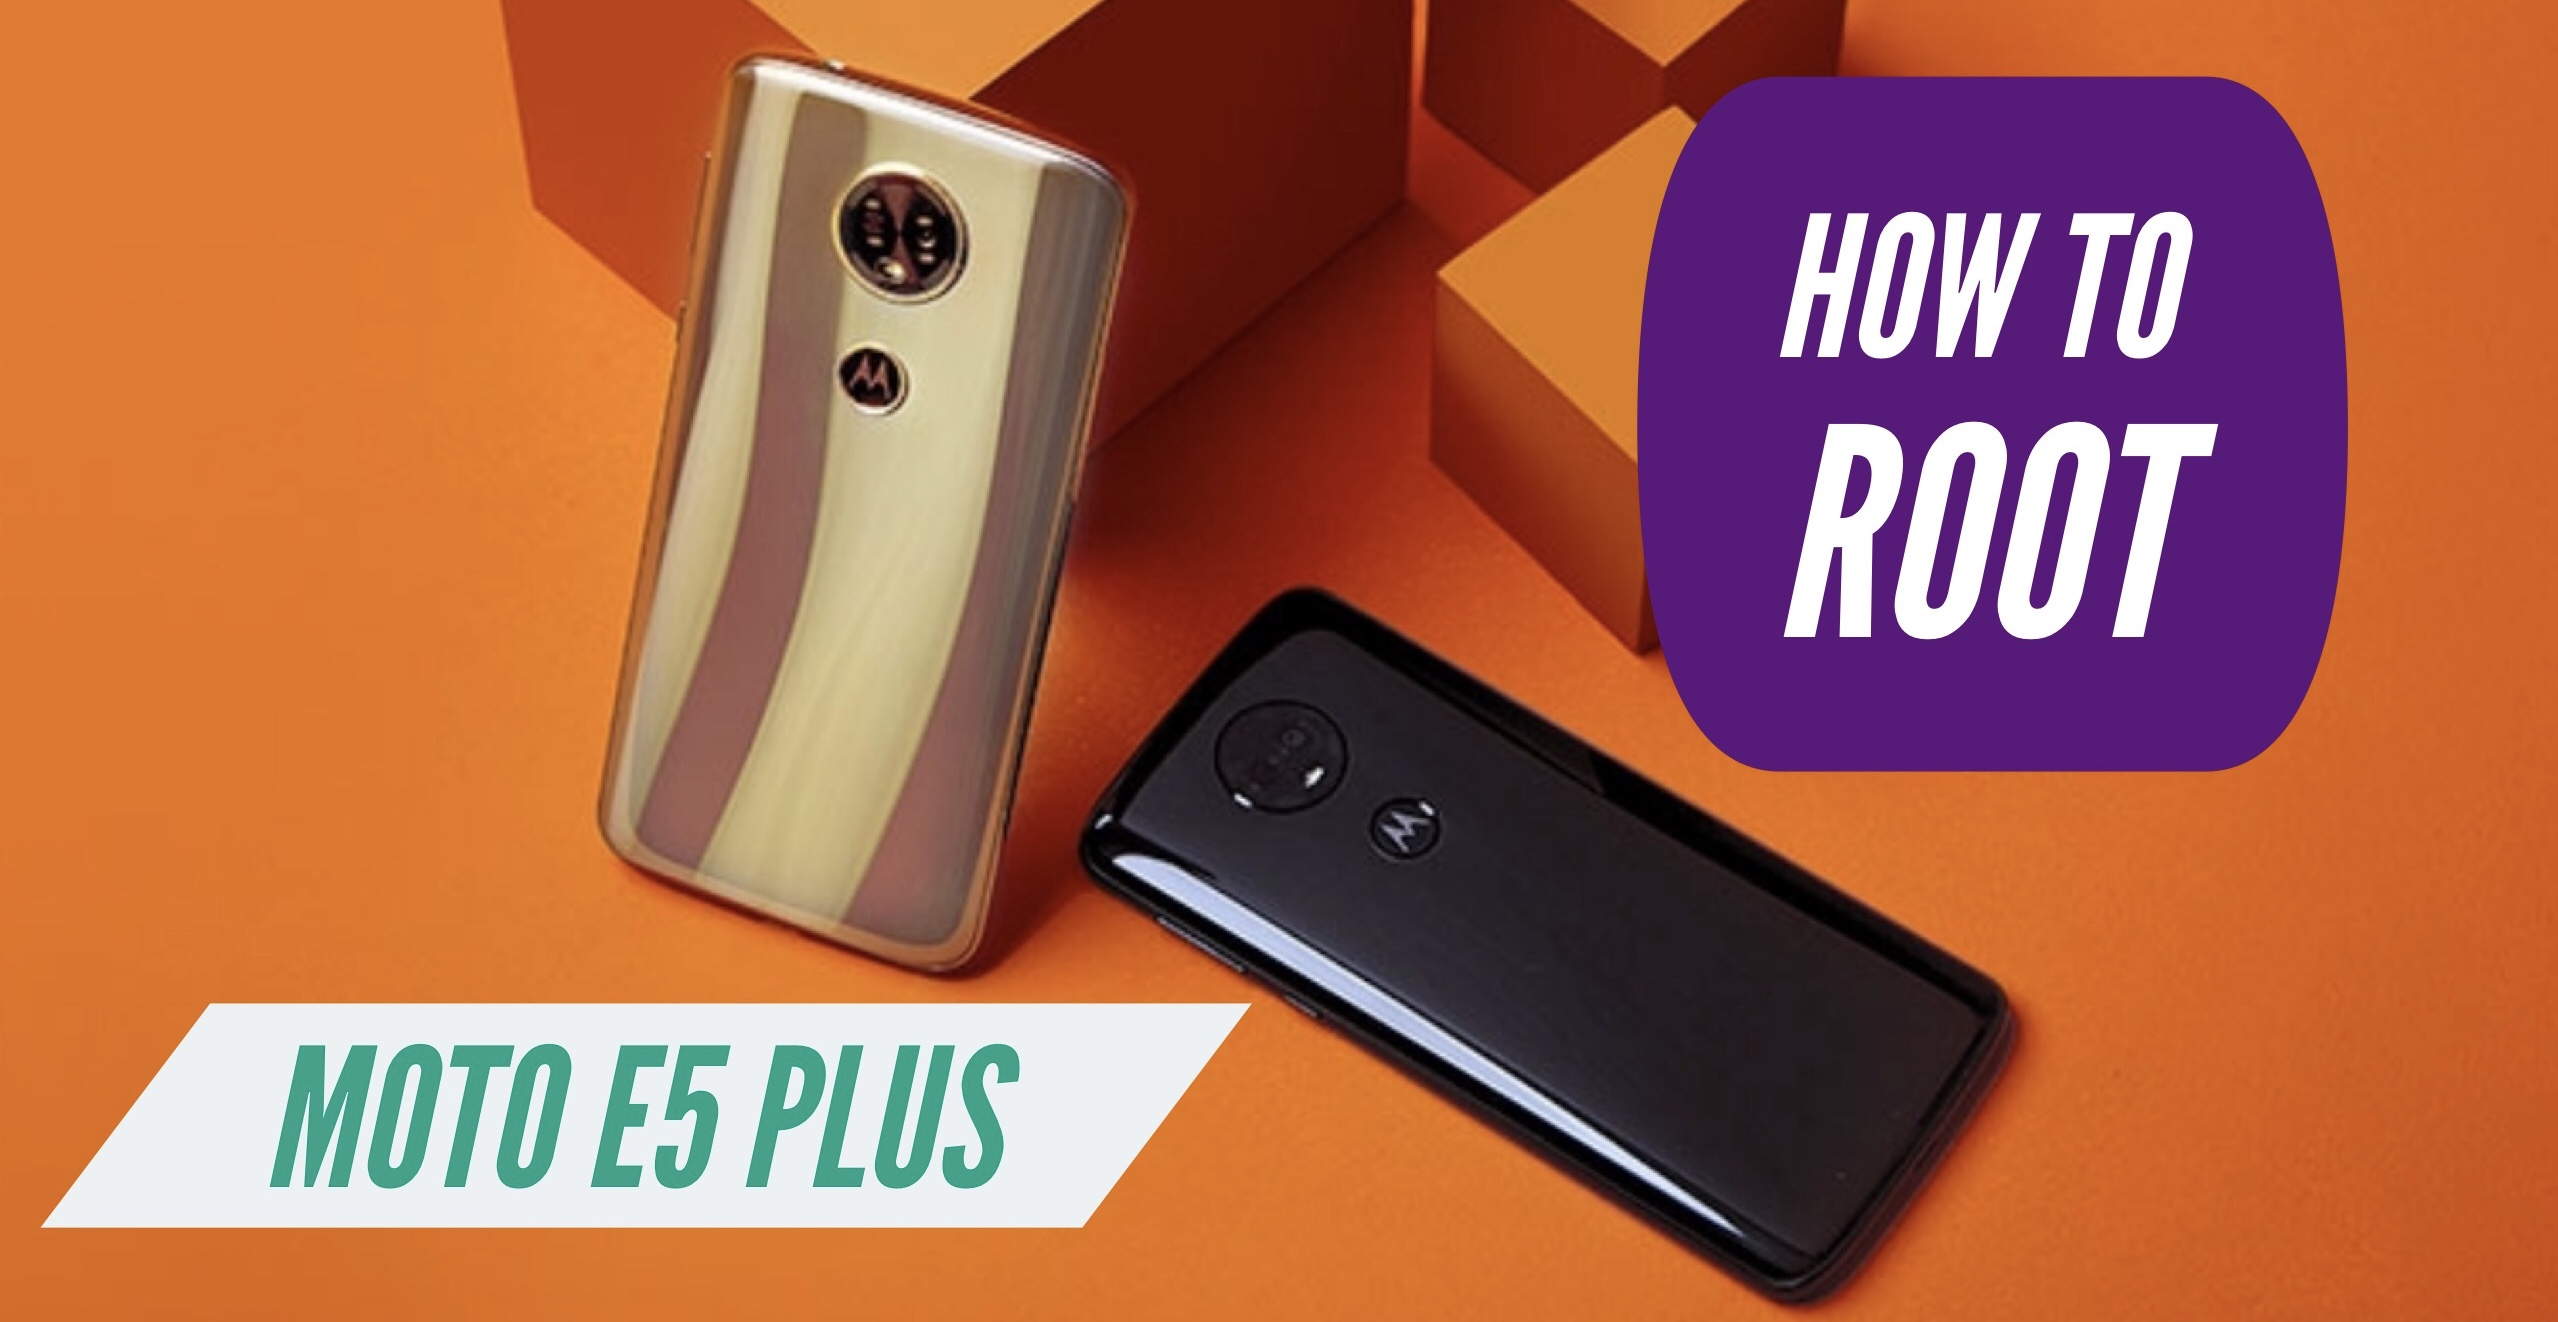 How to Root Motorola Moto E5 Plus with SuperSU & Magisk + MORE!